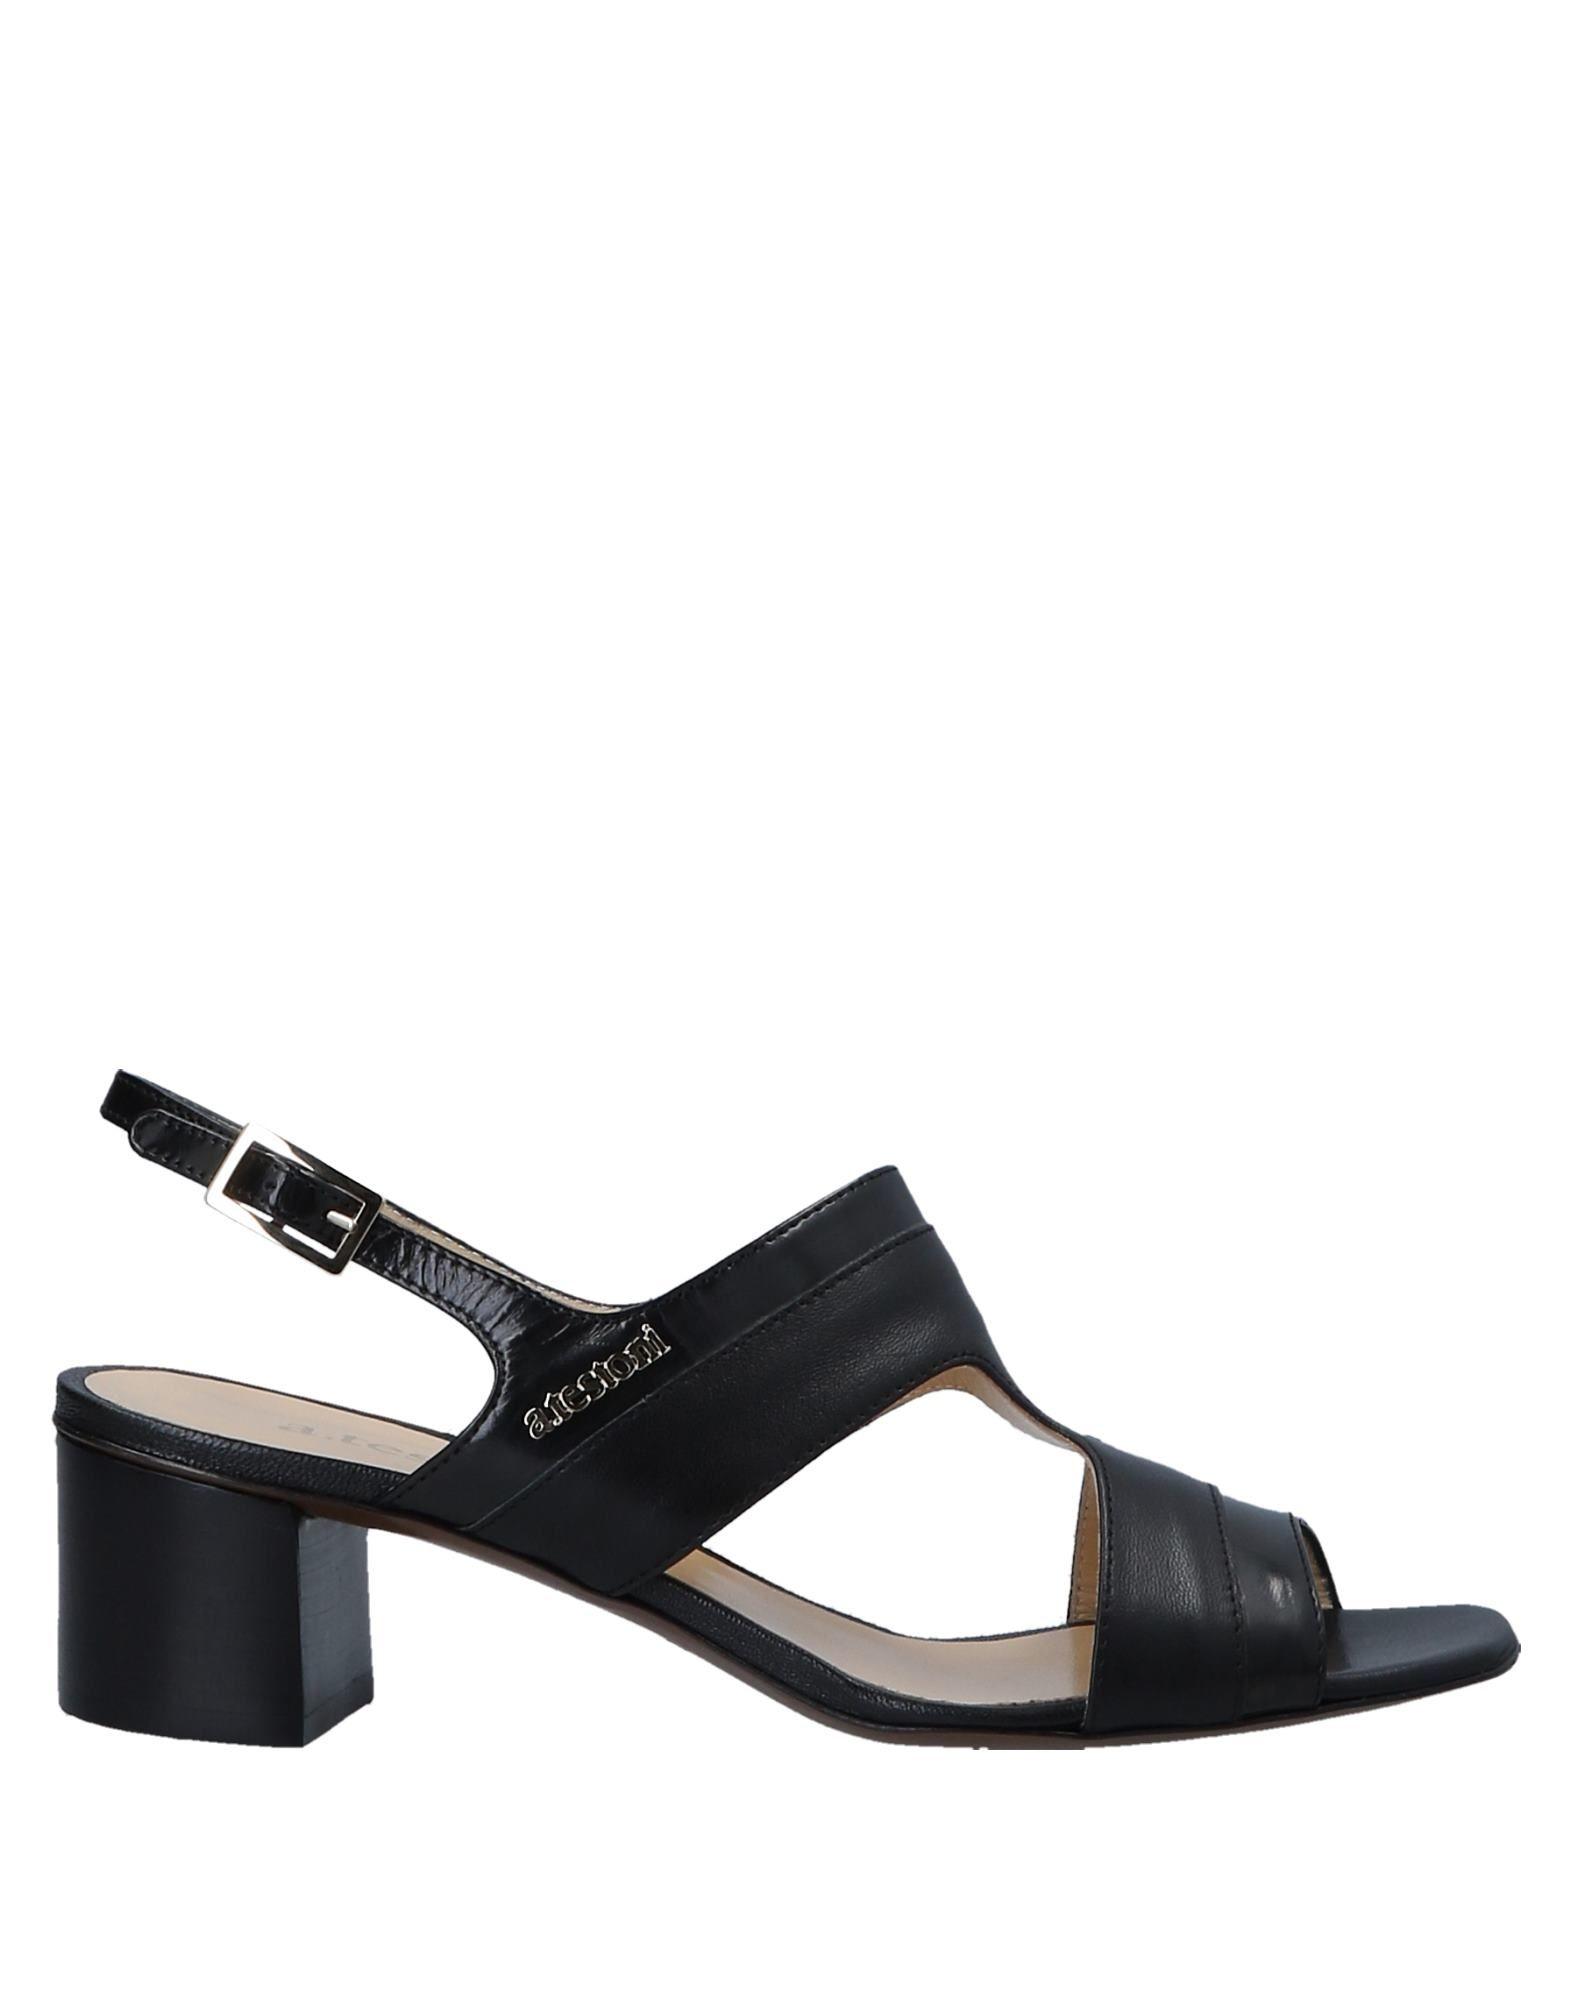 A.Testoni Sandalen Damen  11555596AWGut aussehende strapazierfähige Schuhe